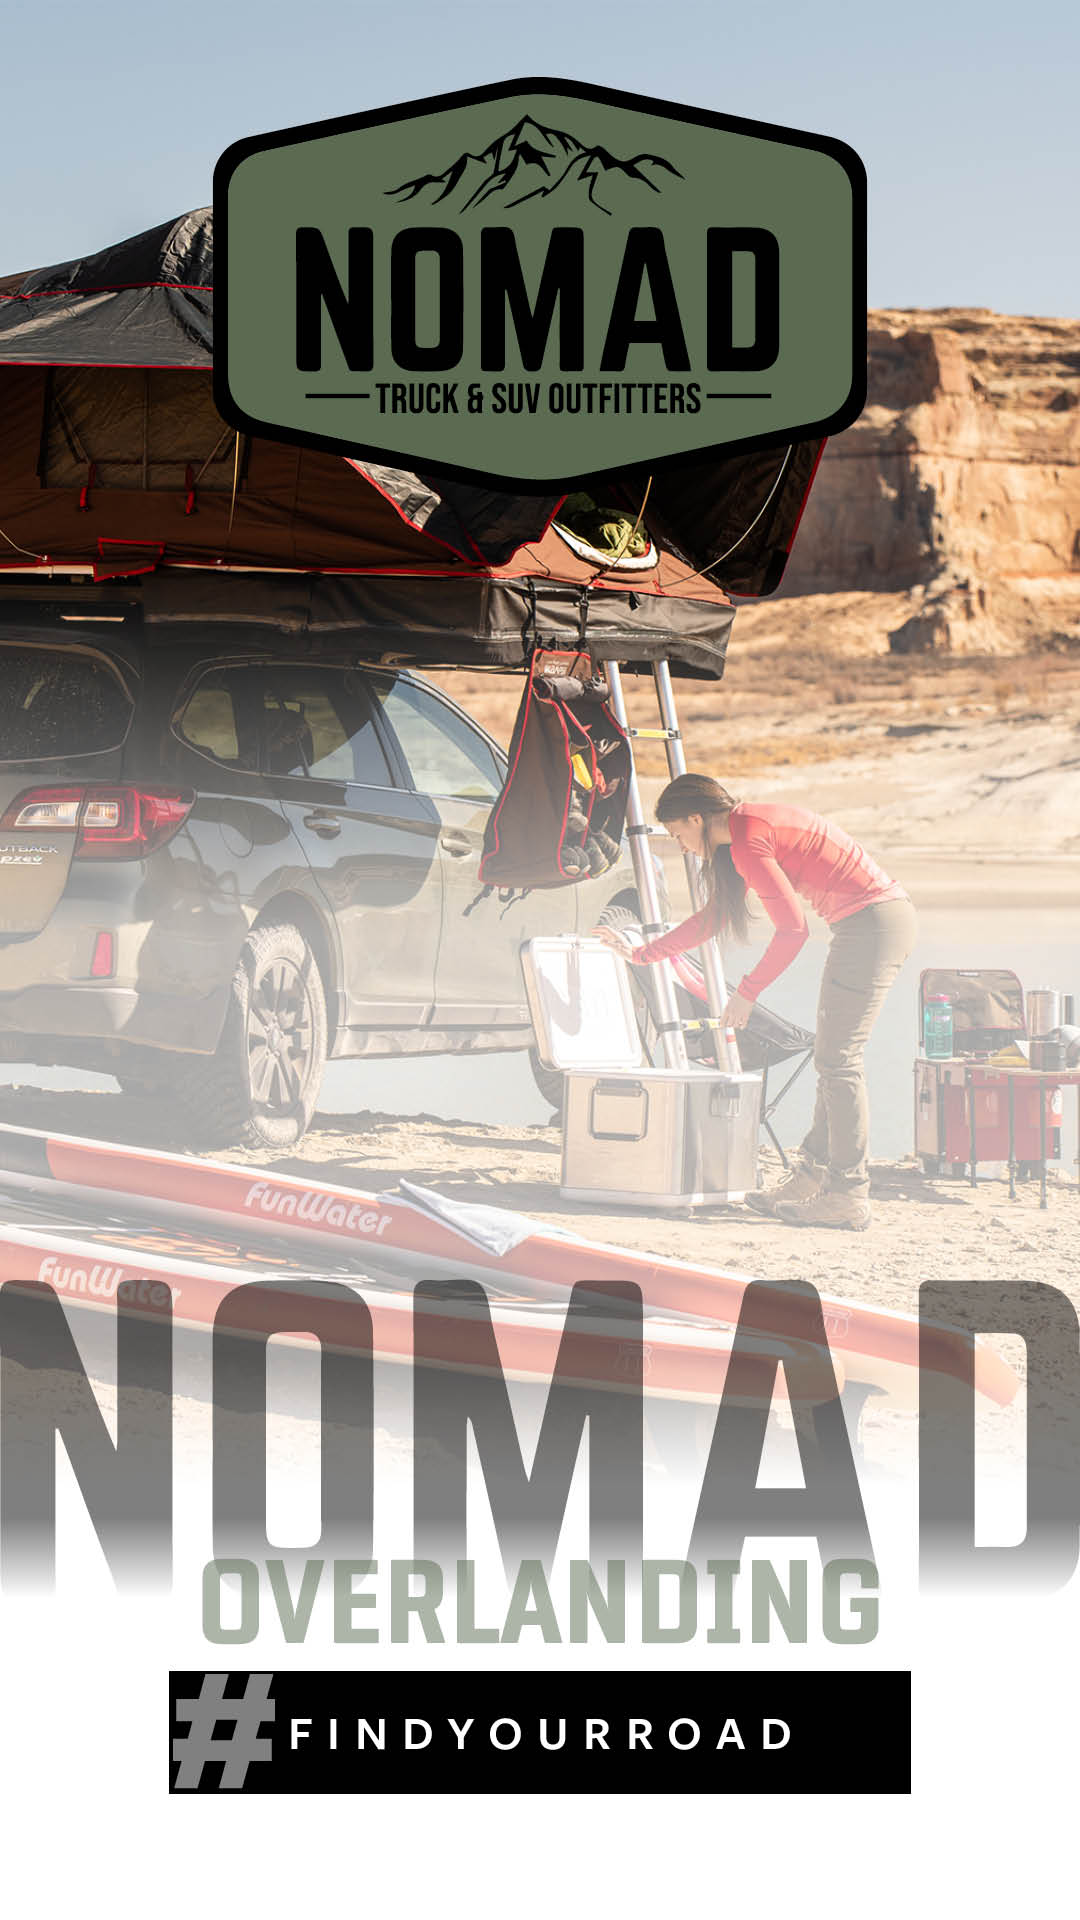 NOMAD_Overlanding2